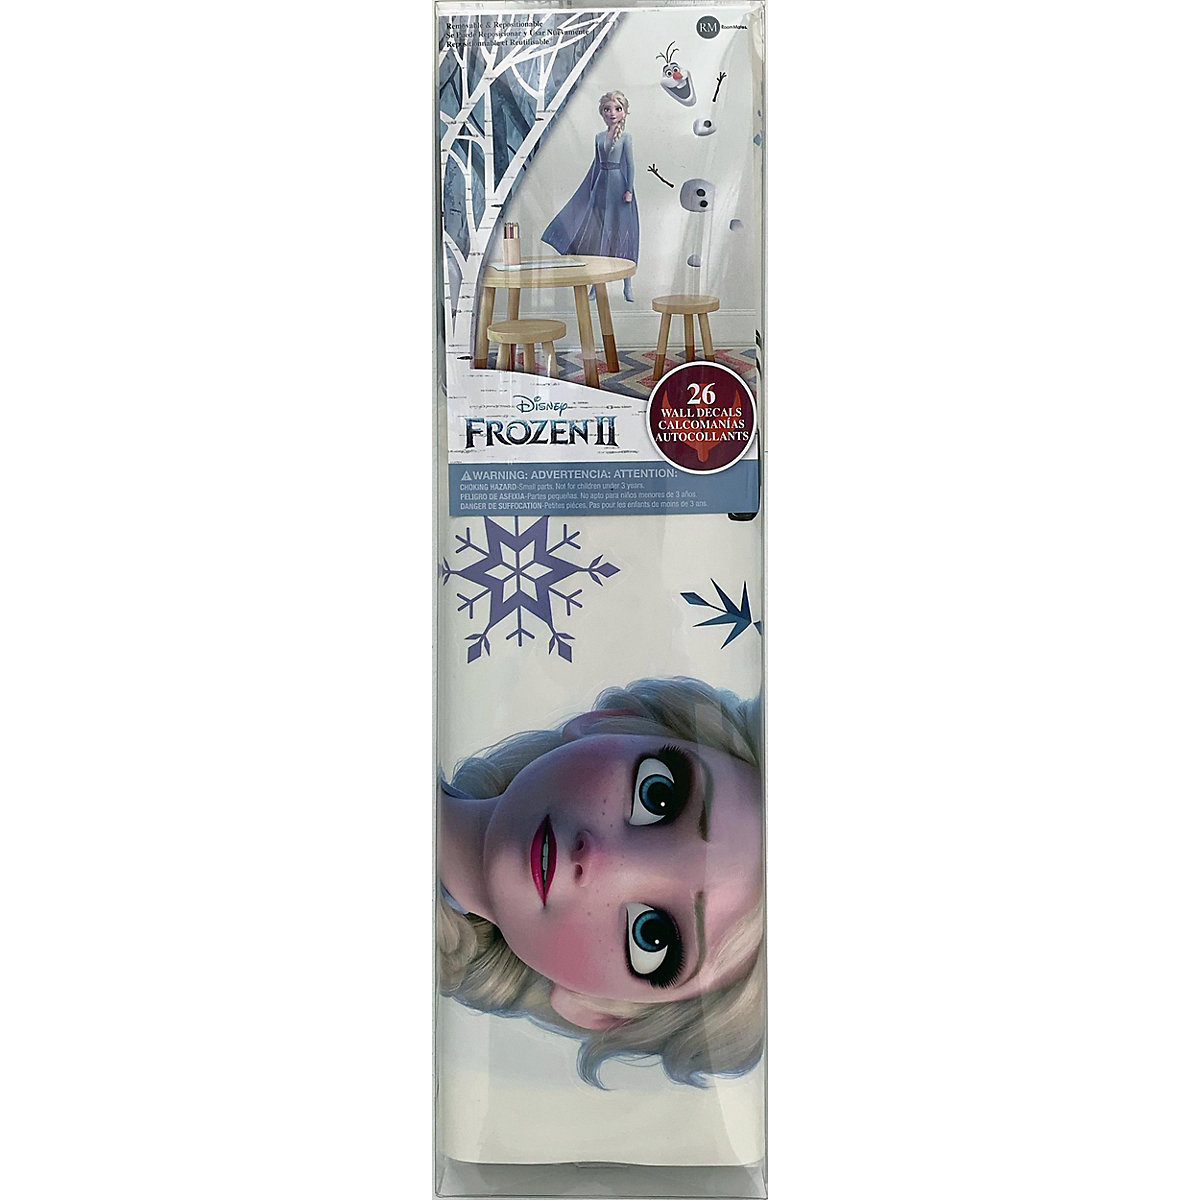 Wandsticker Disney Frozen II - Elsa & Olaf Disney Die Eiskönigin q1z5w